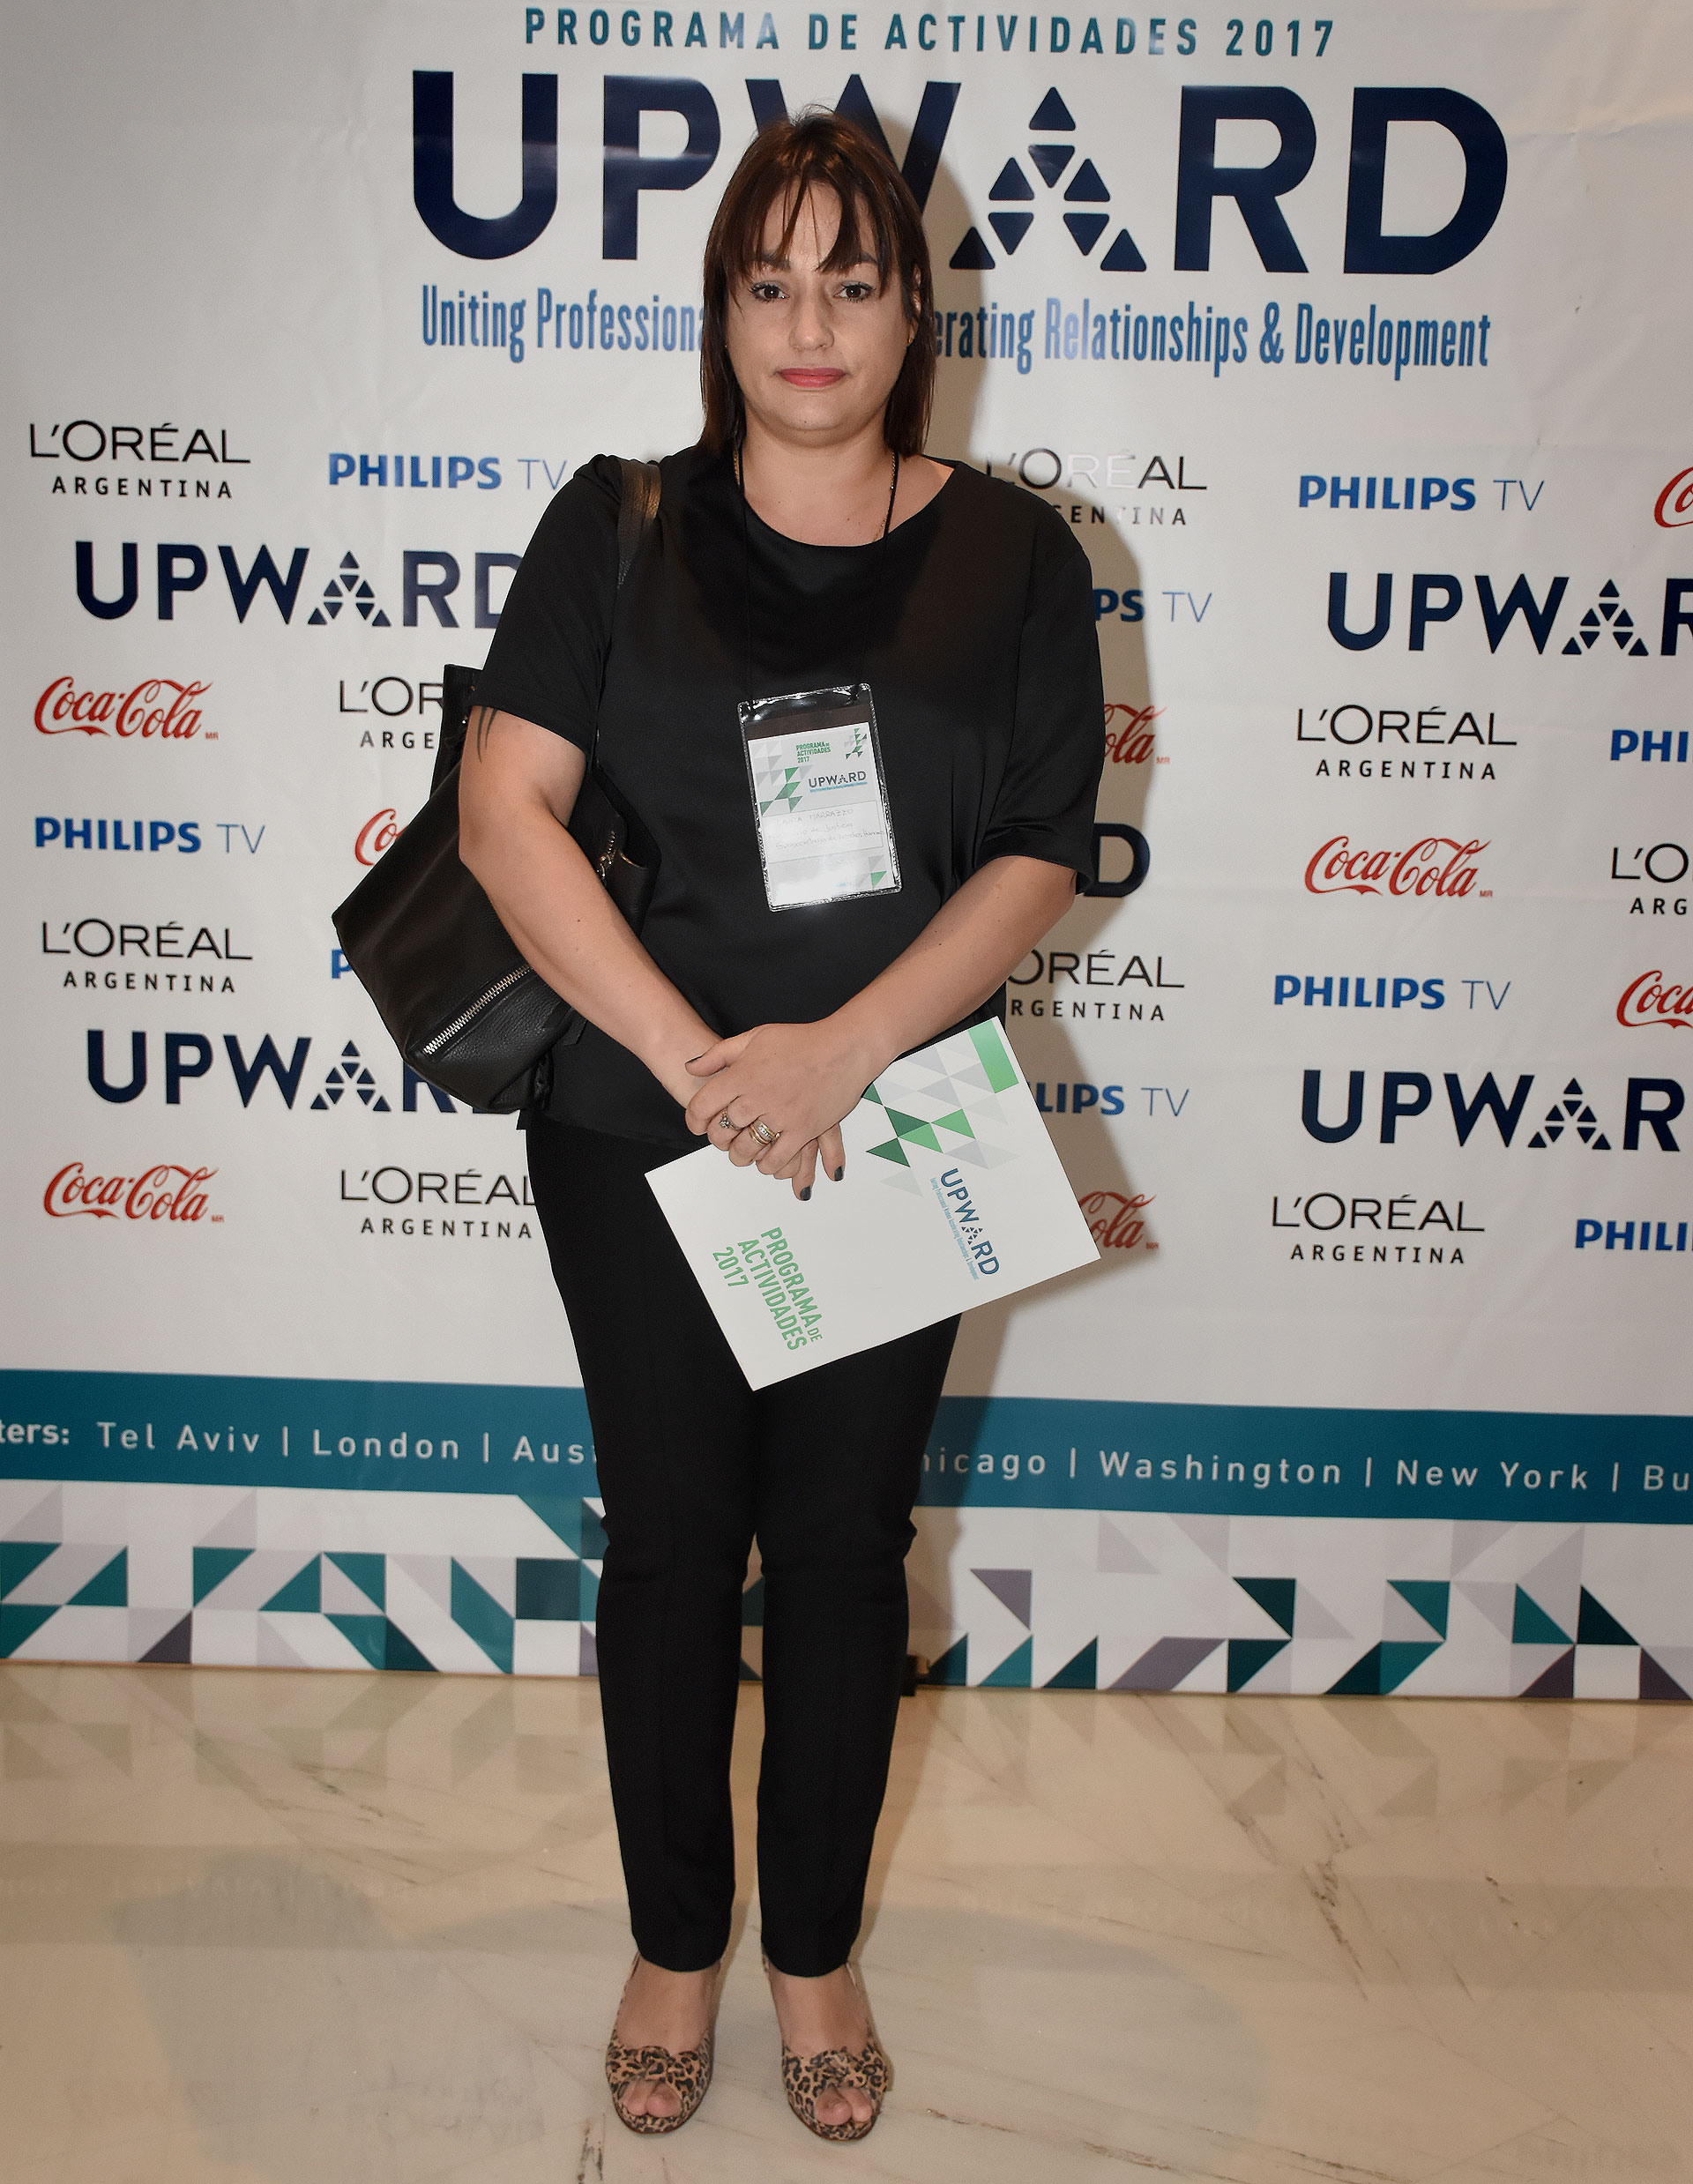 Laura Marrazzo